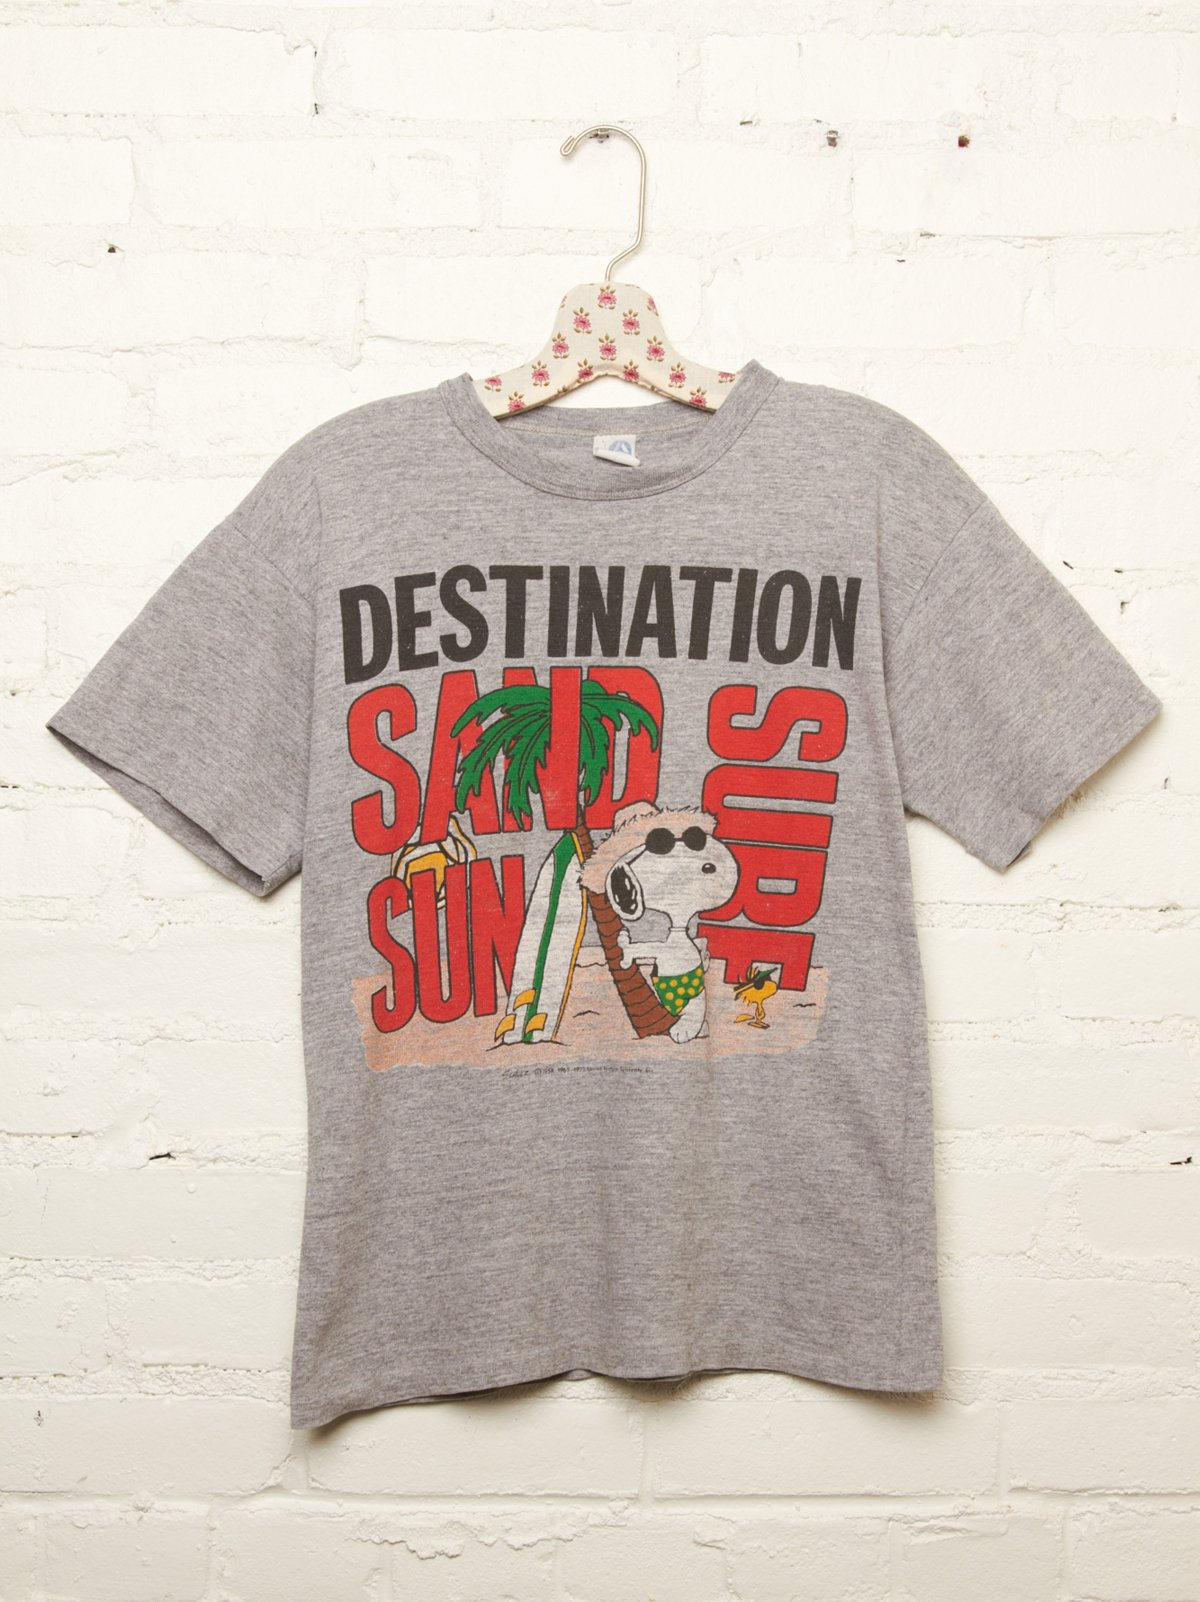 Vintage Snoopy Destination Tee